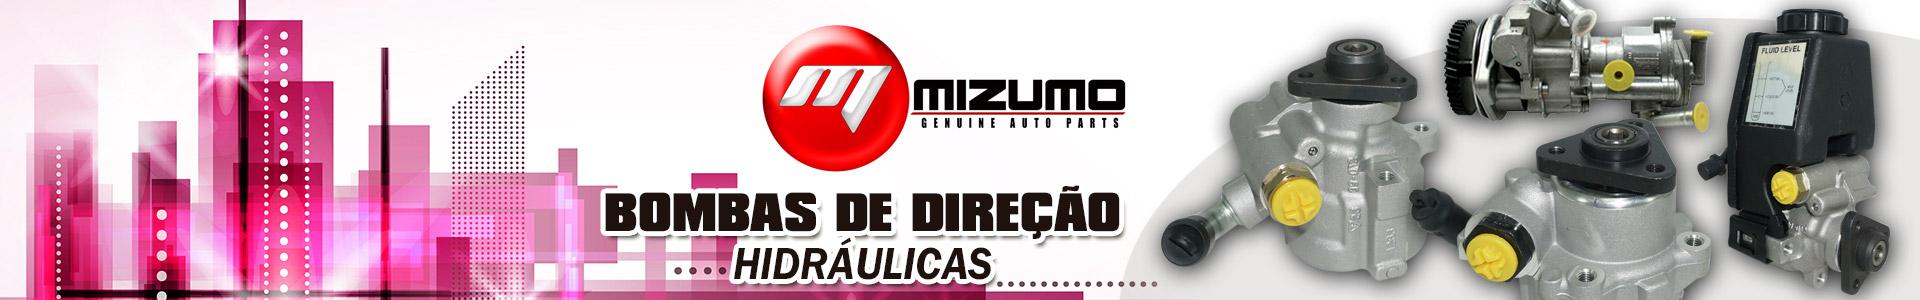 bombas-direcao-mizuno-ips-brasil